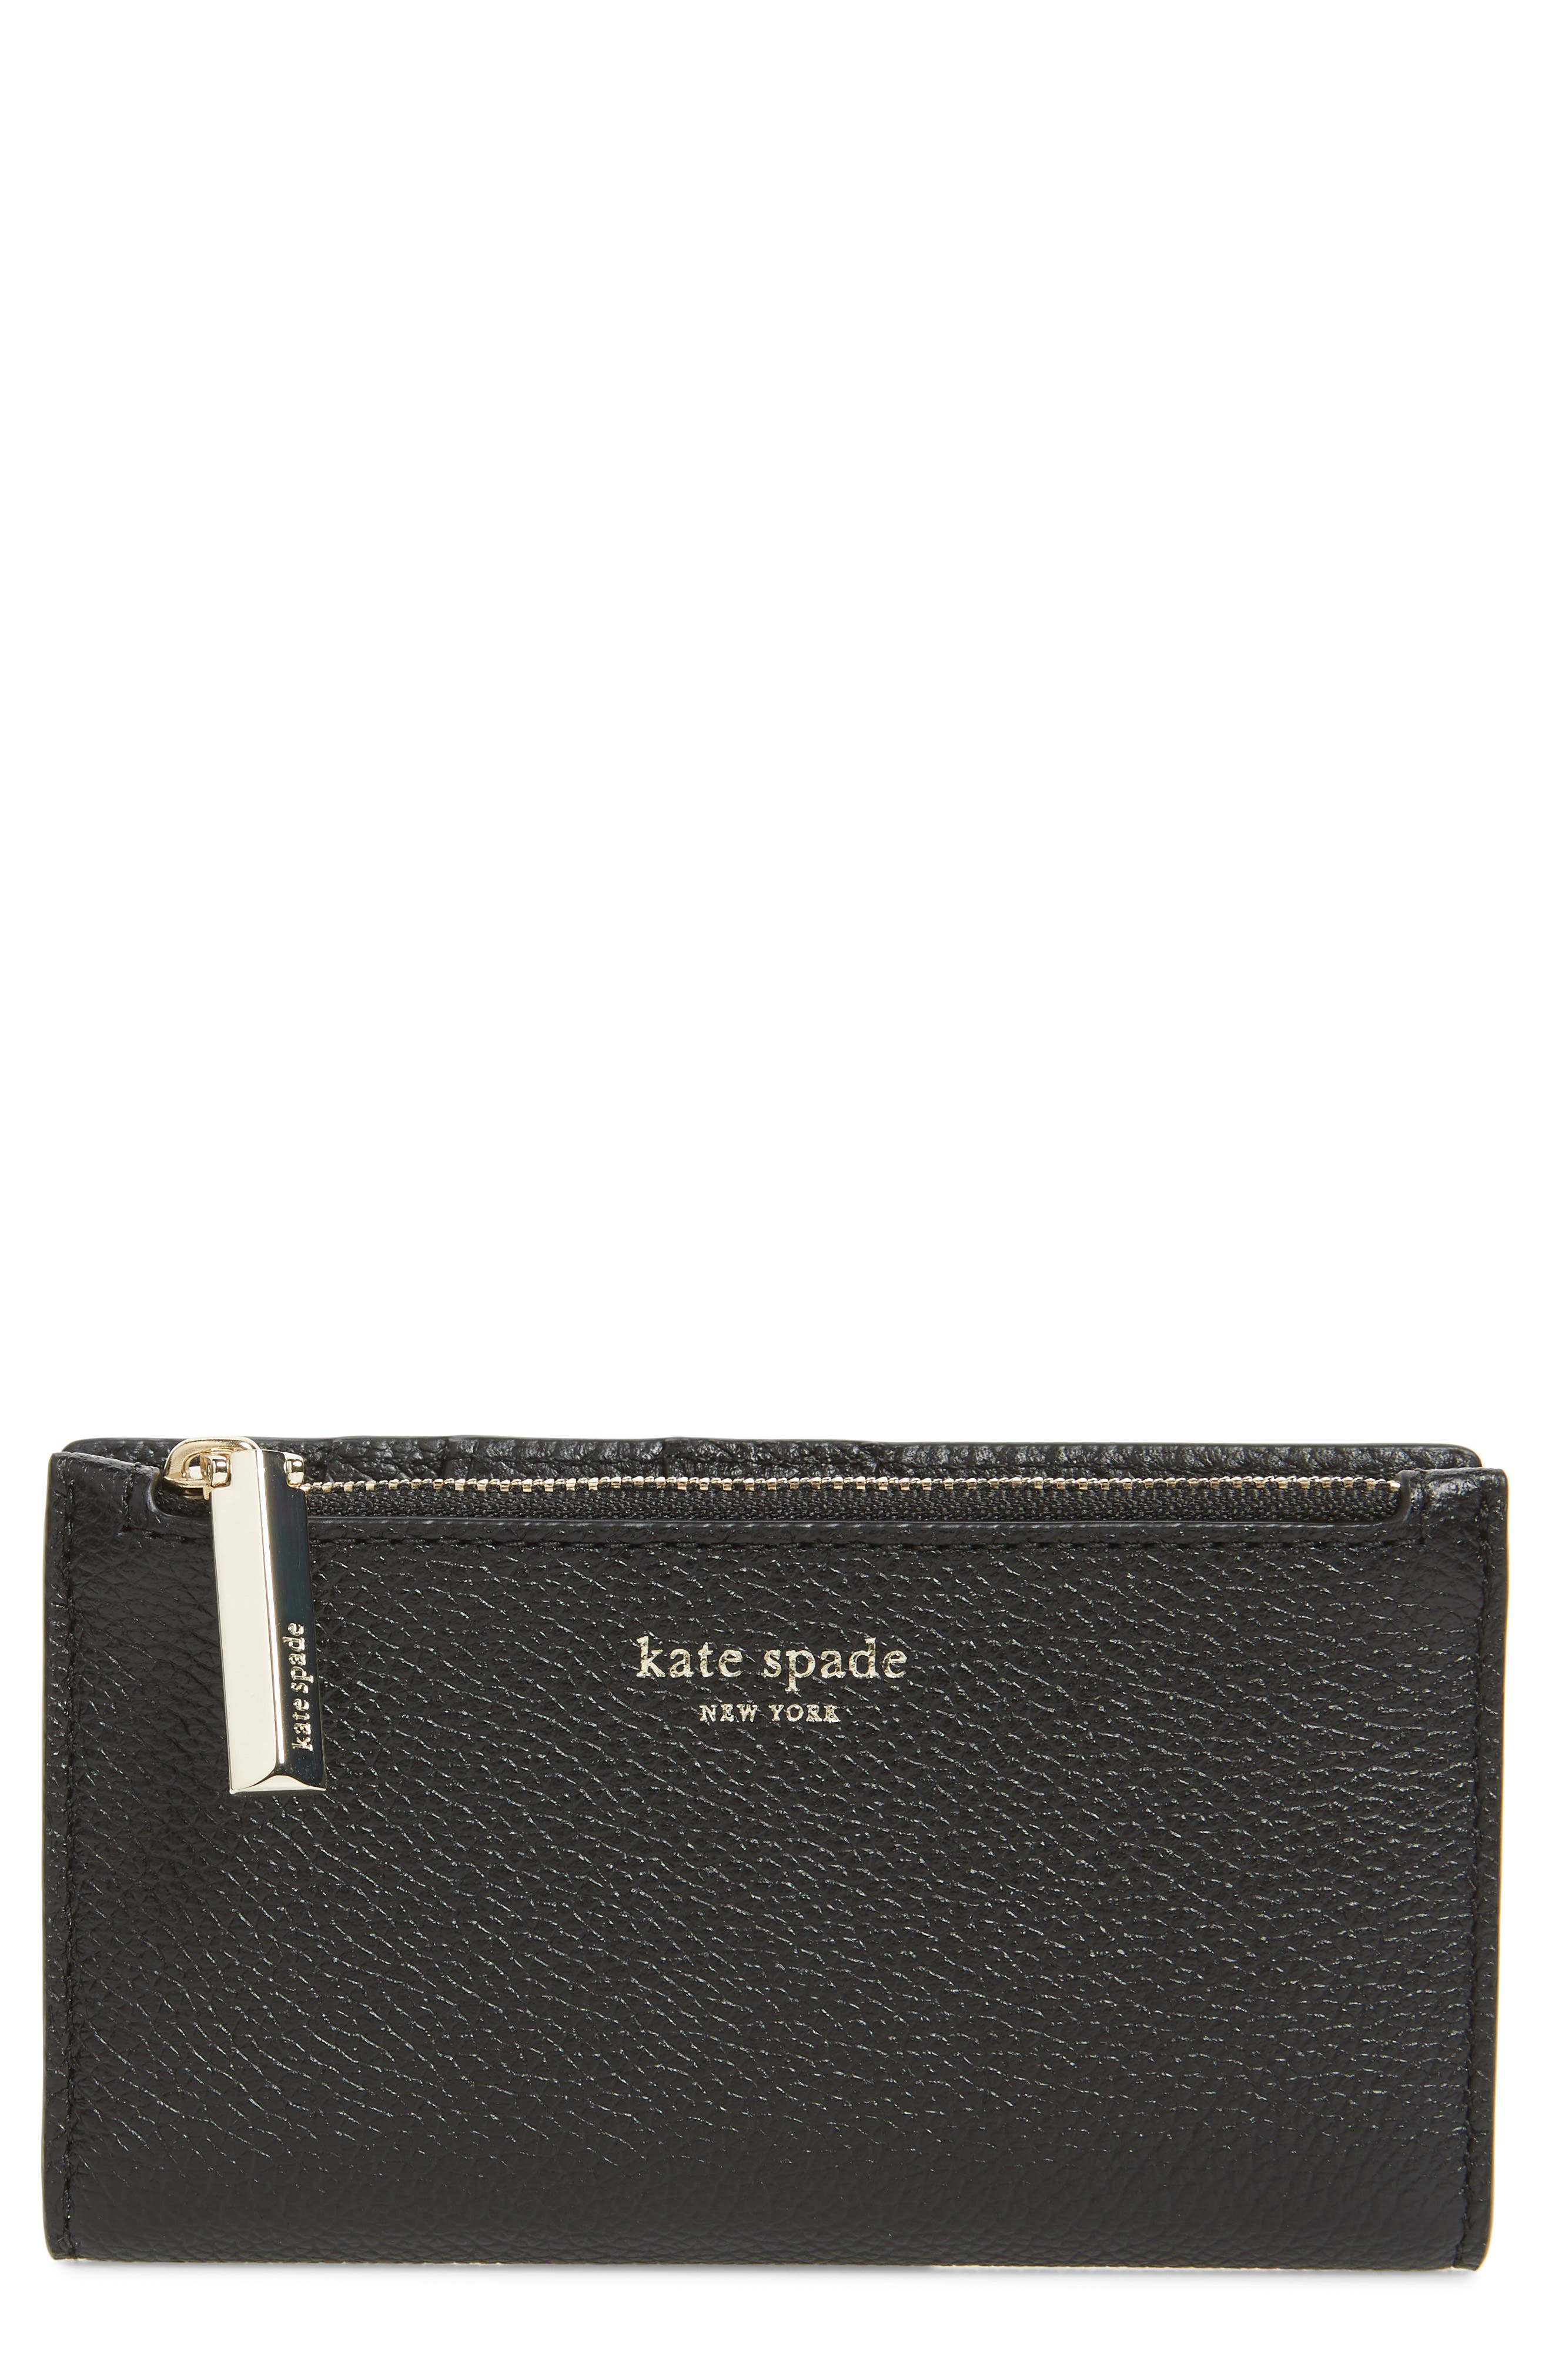 KATE SPADE NEW YORK,                             margaux slim bifold wallet,                             Main thumbnail 1, color,                             BLACK